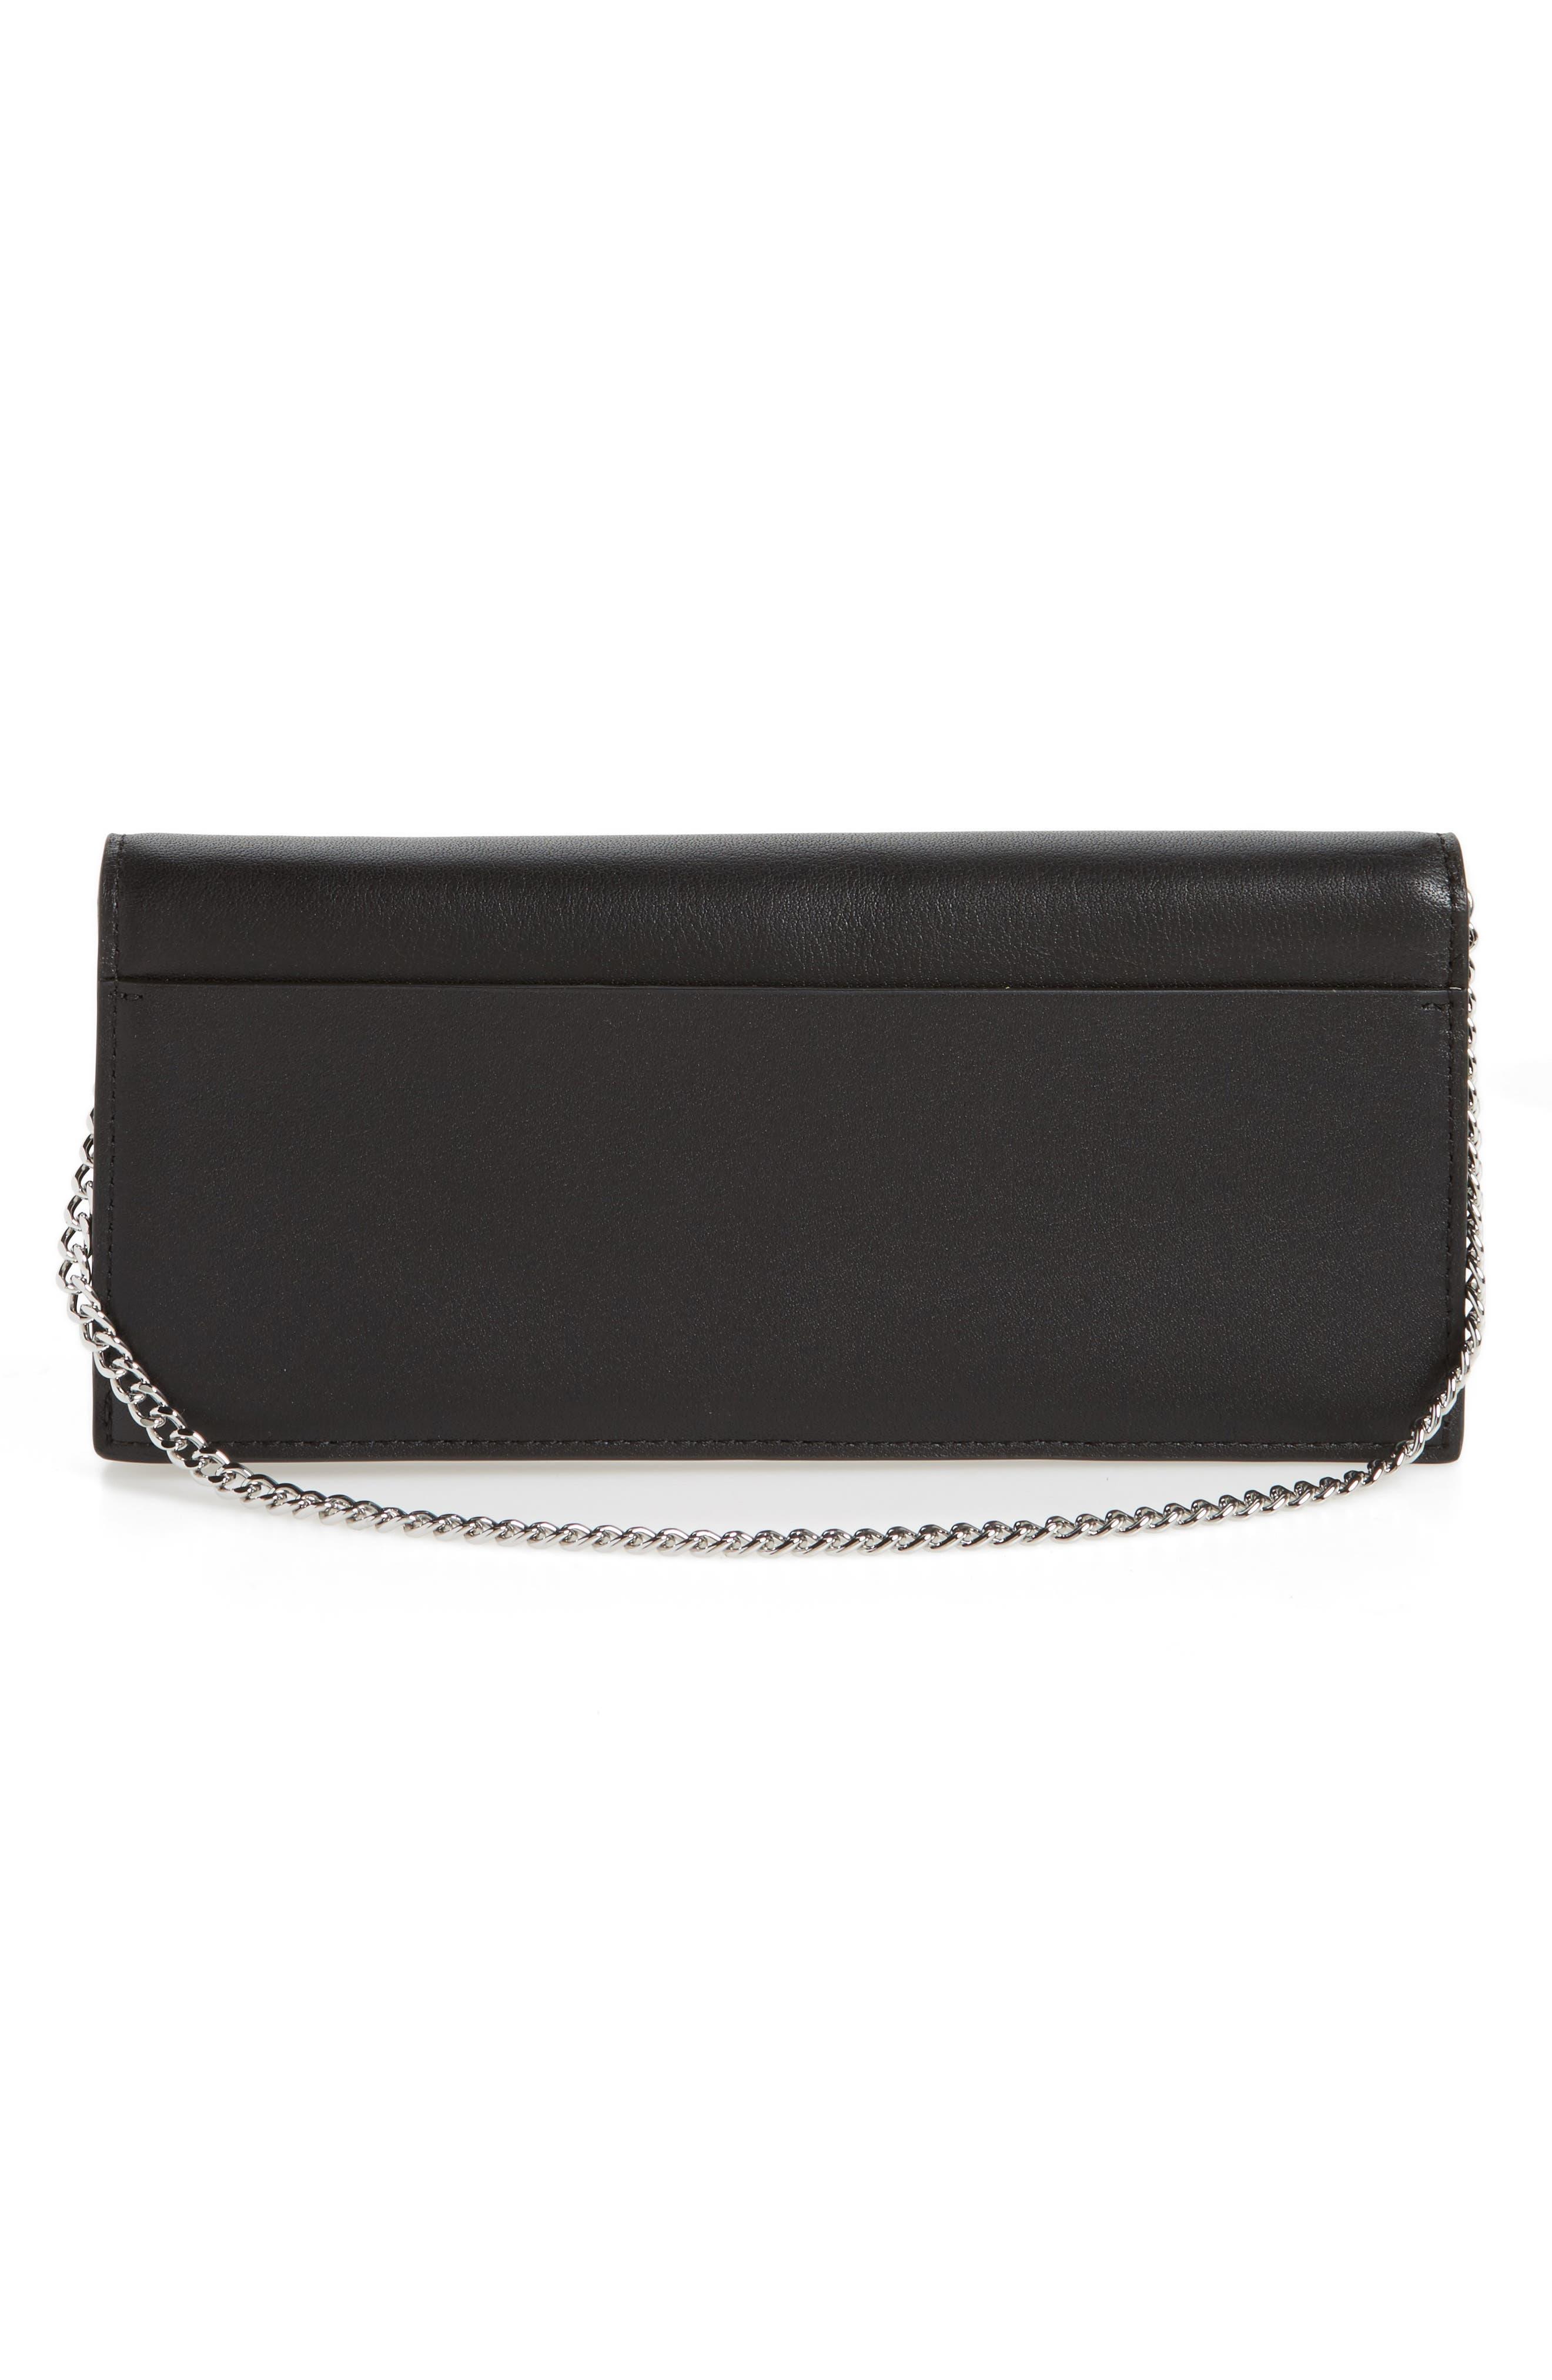 Keel Leather Wallet,                             Alternate thumbnail 3, color,                             001